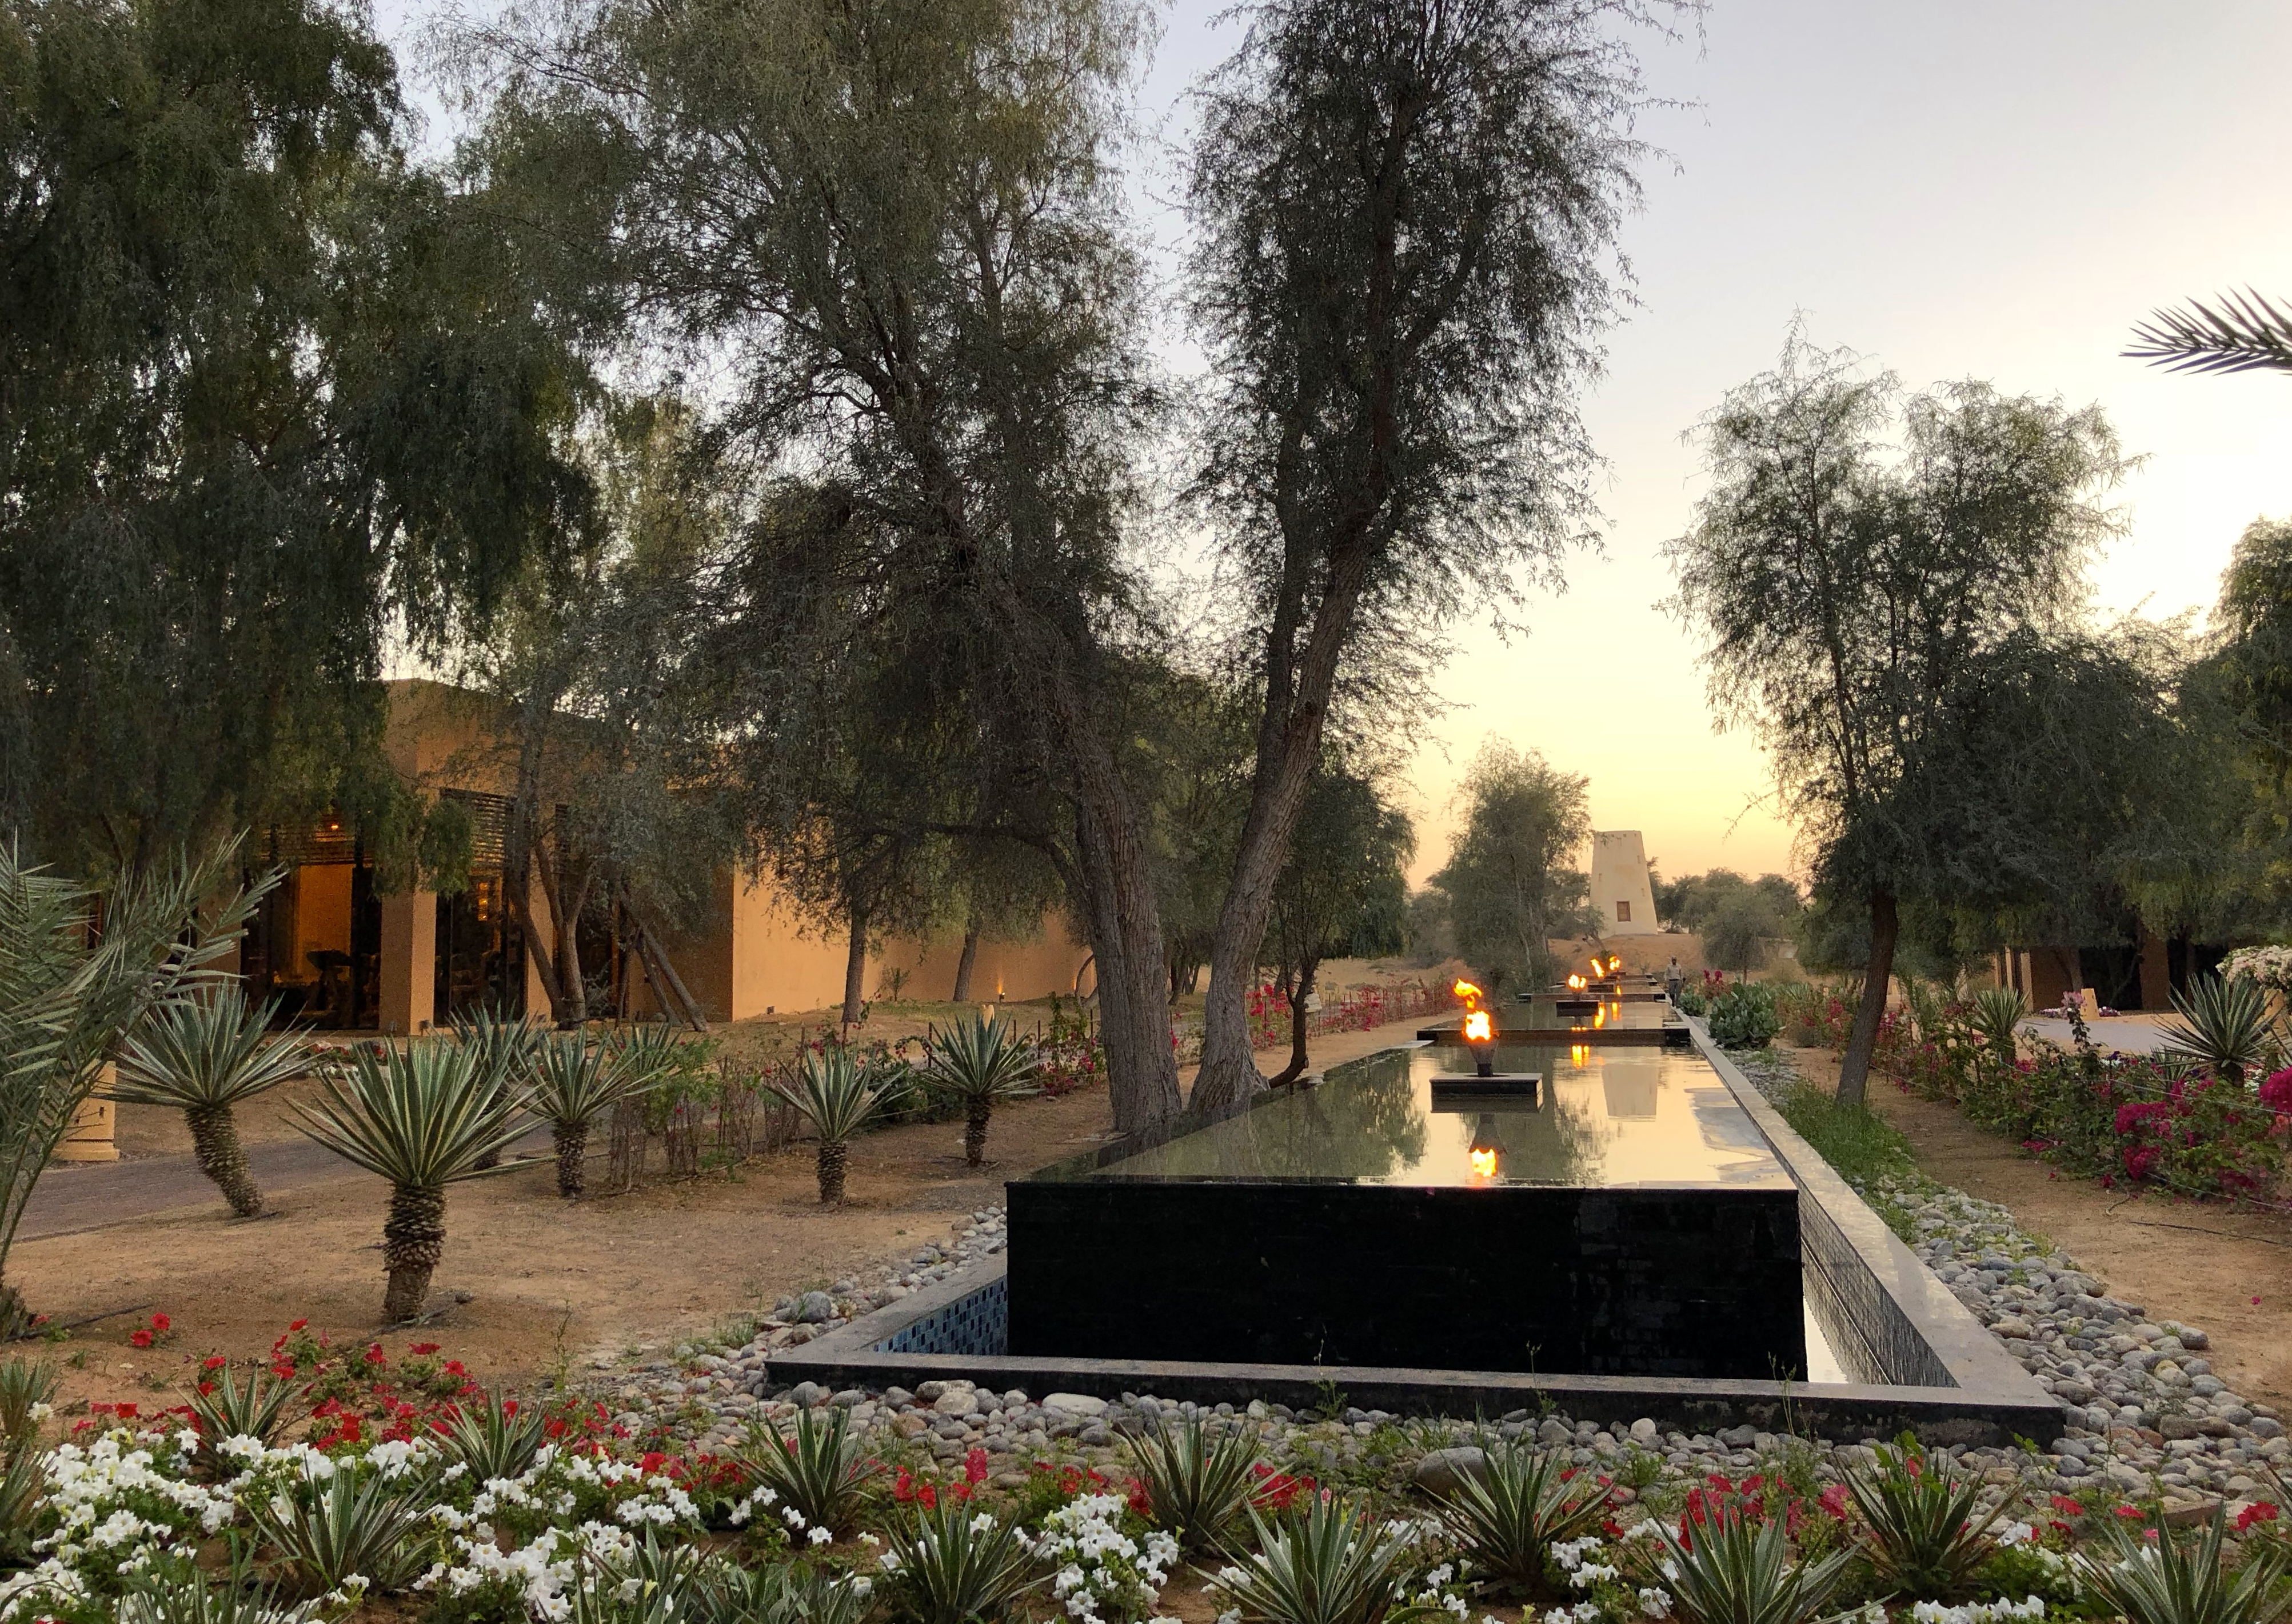 The Ritz Carlton, Ras Al Khaimah, Al wadai desert 19